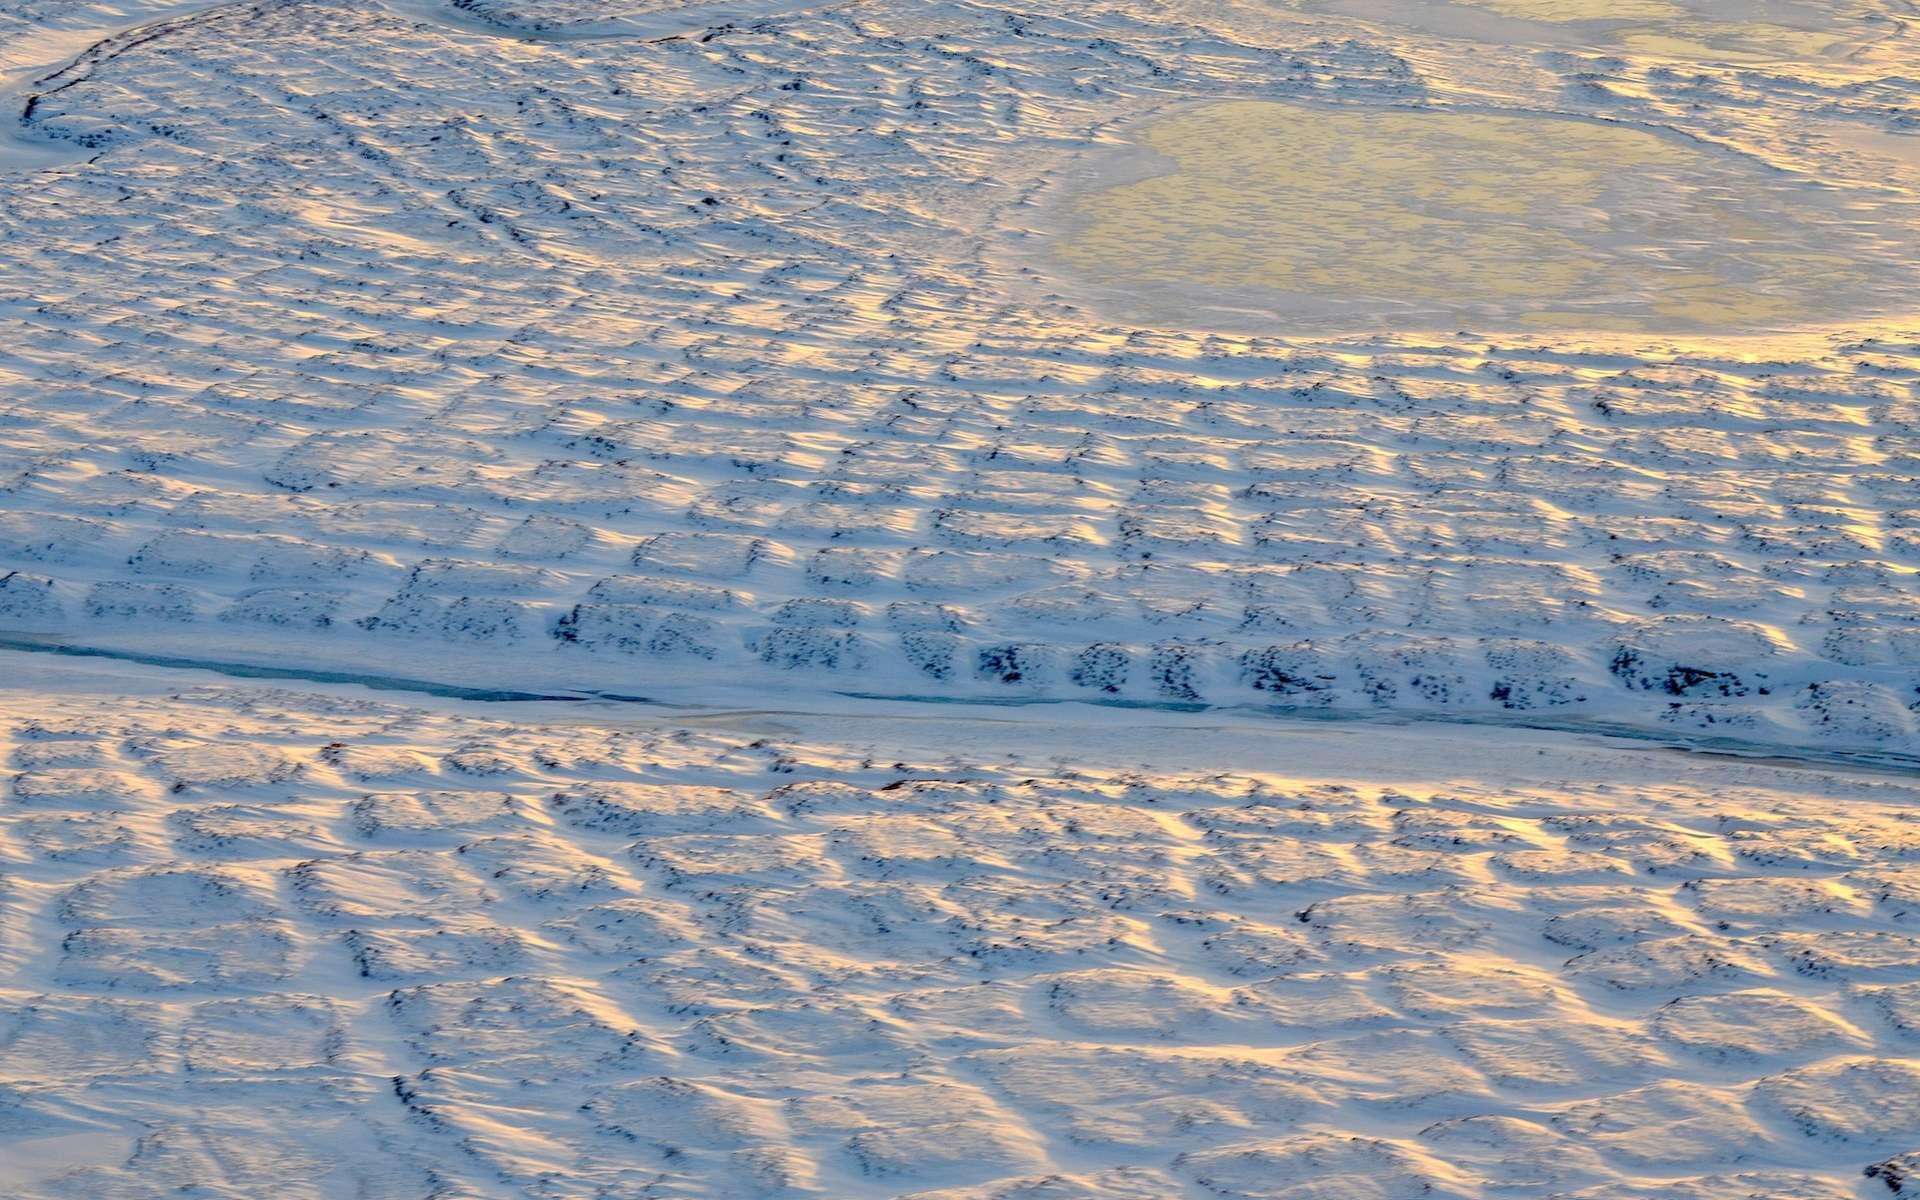 Vue aérienne de la toundra dans le nord de l'Alaska en novembre 2015. © Nasa, JPL-Caltech, Charles Miller